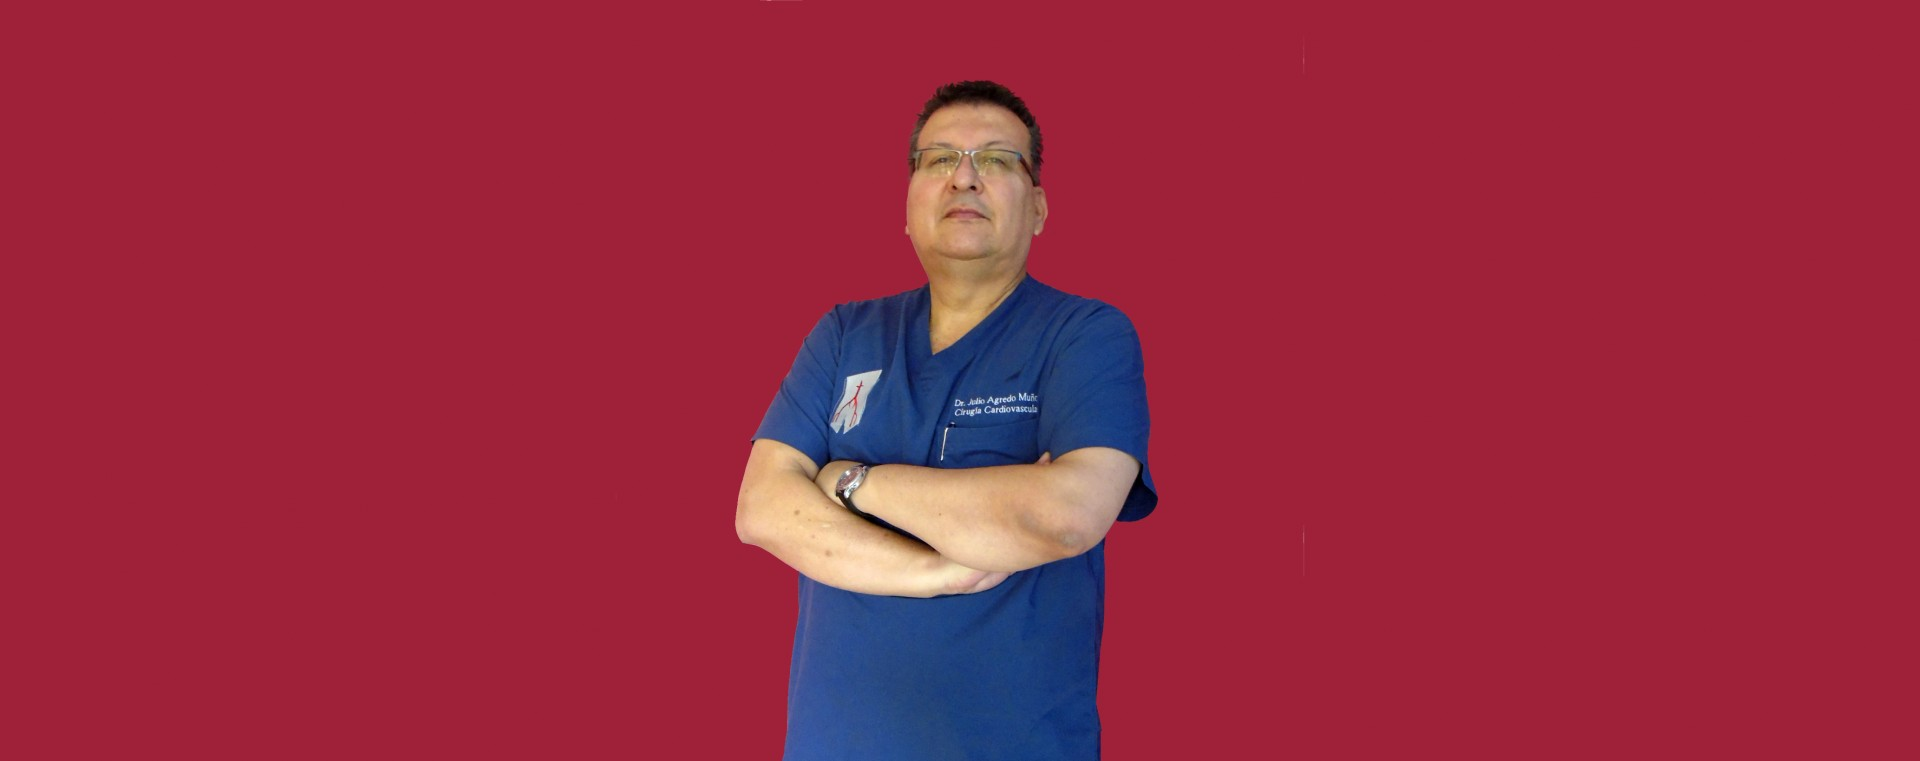 Dr. Julio Agredo Muñoz